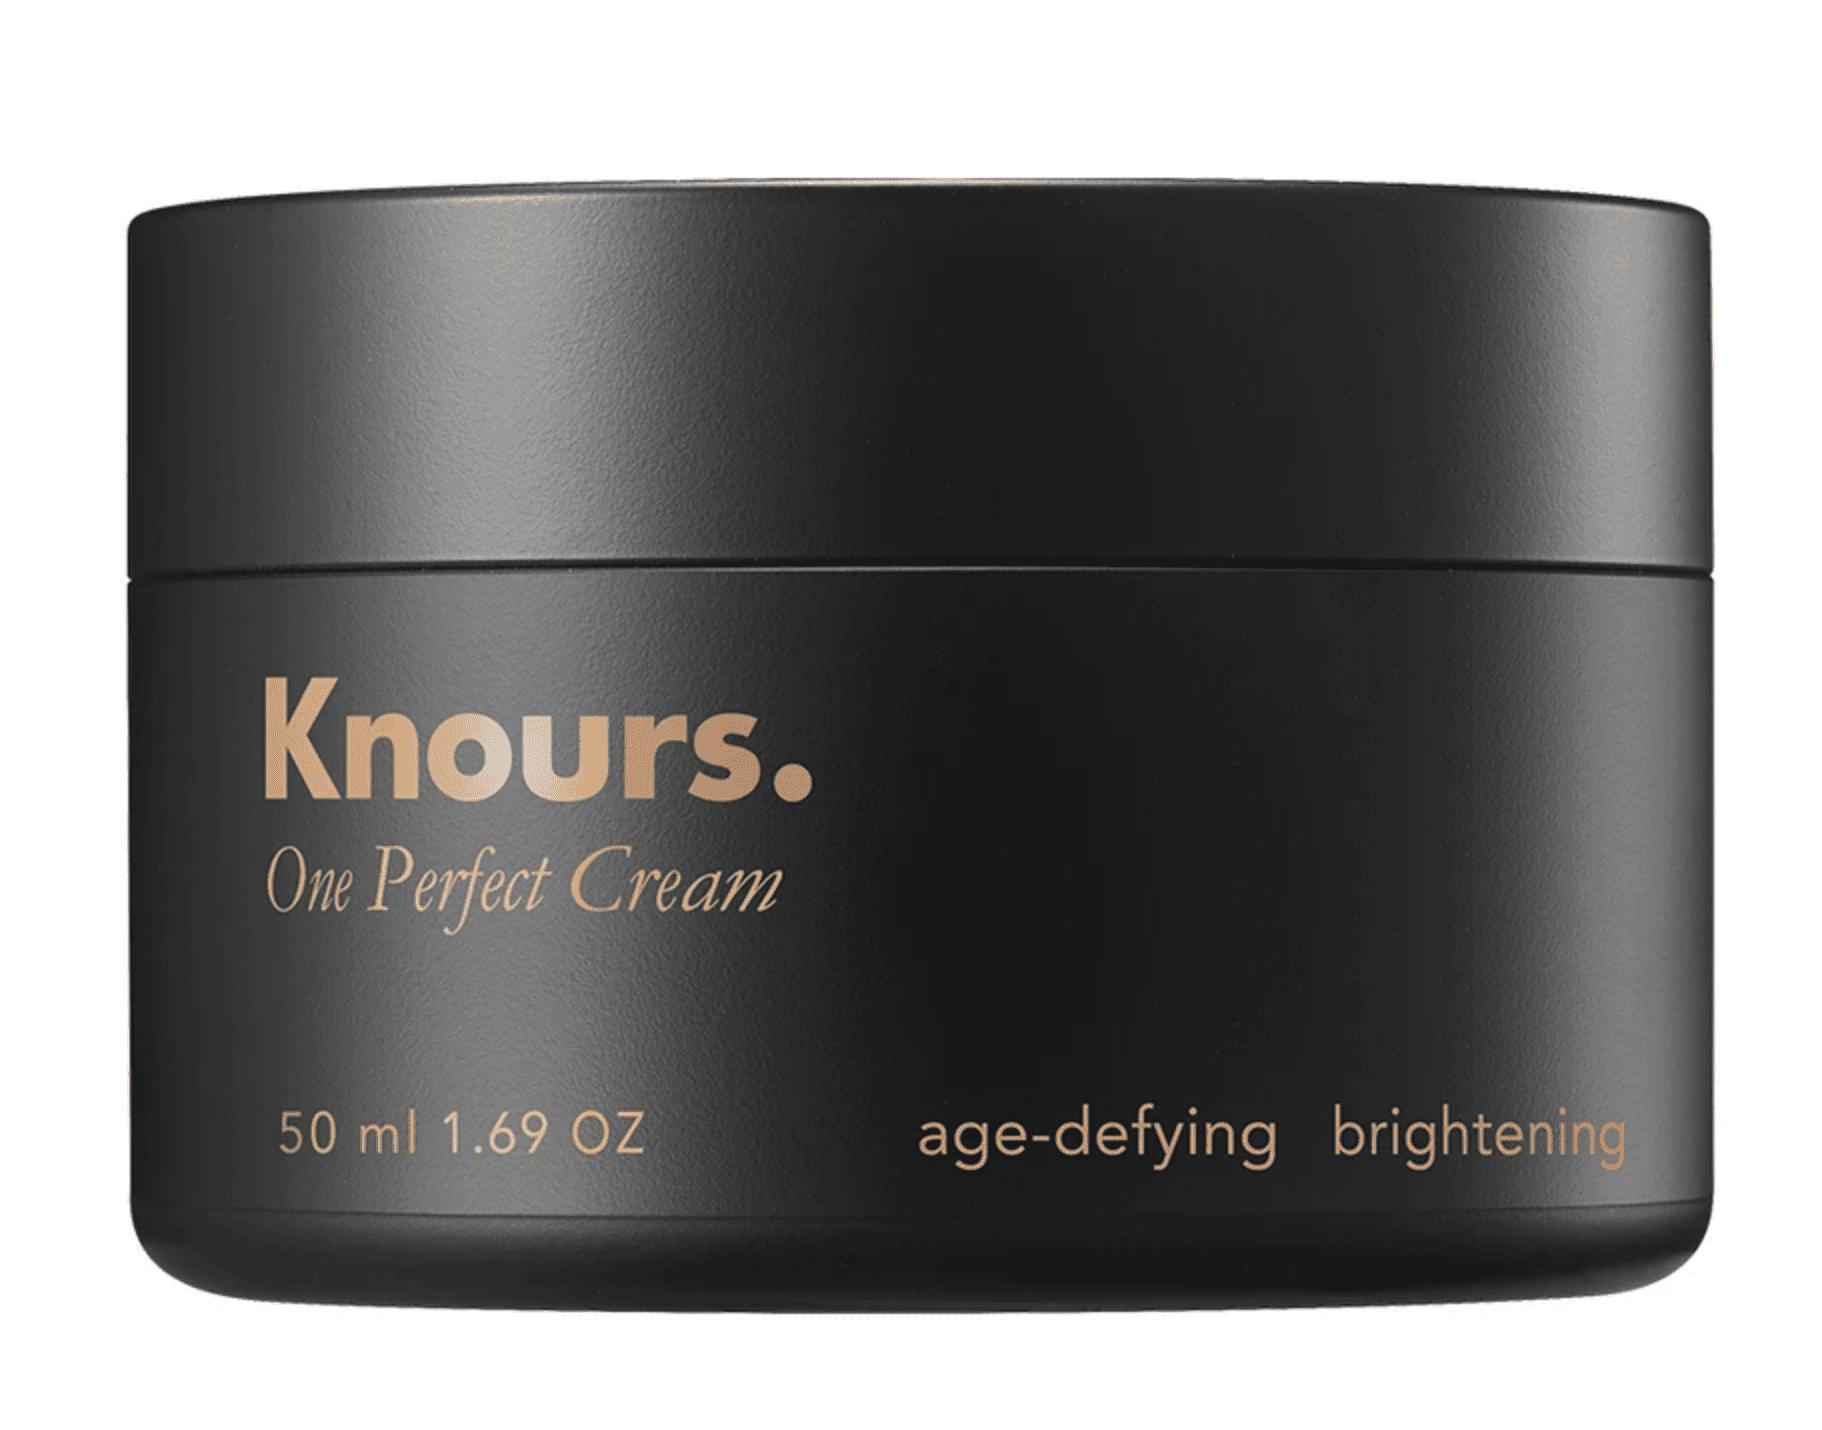 One Perfect Cream